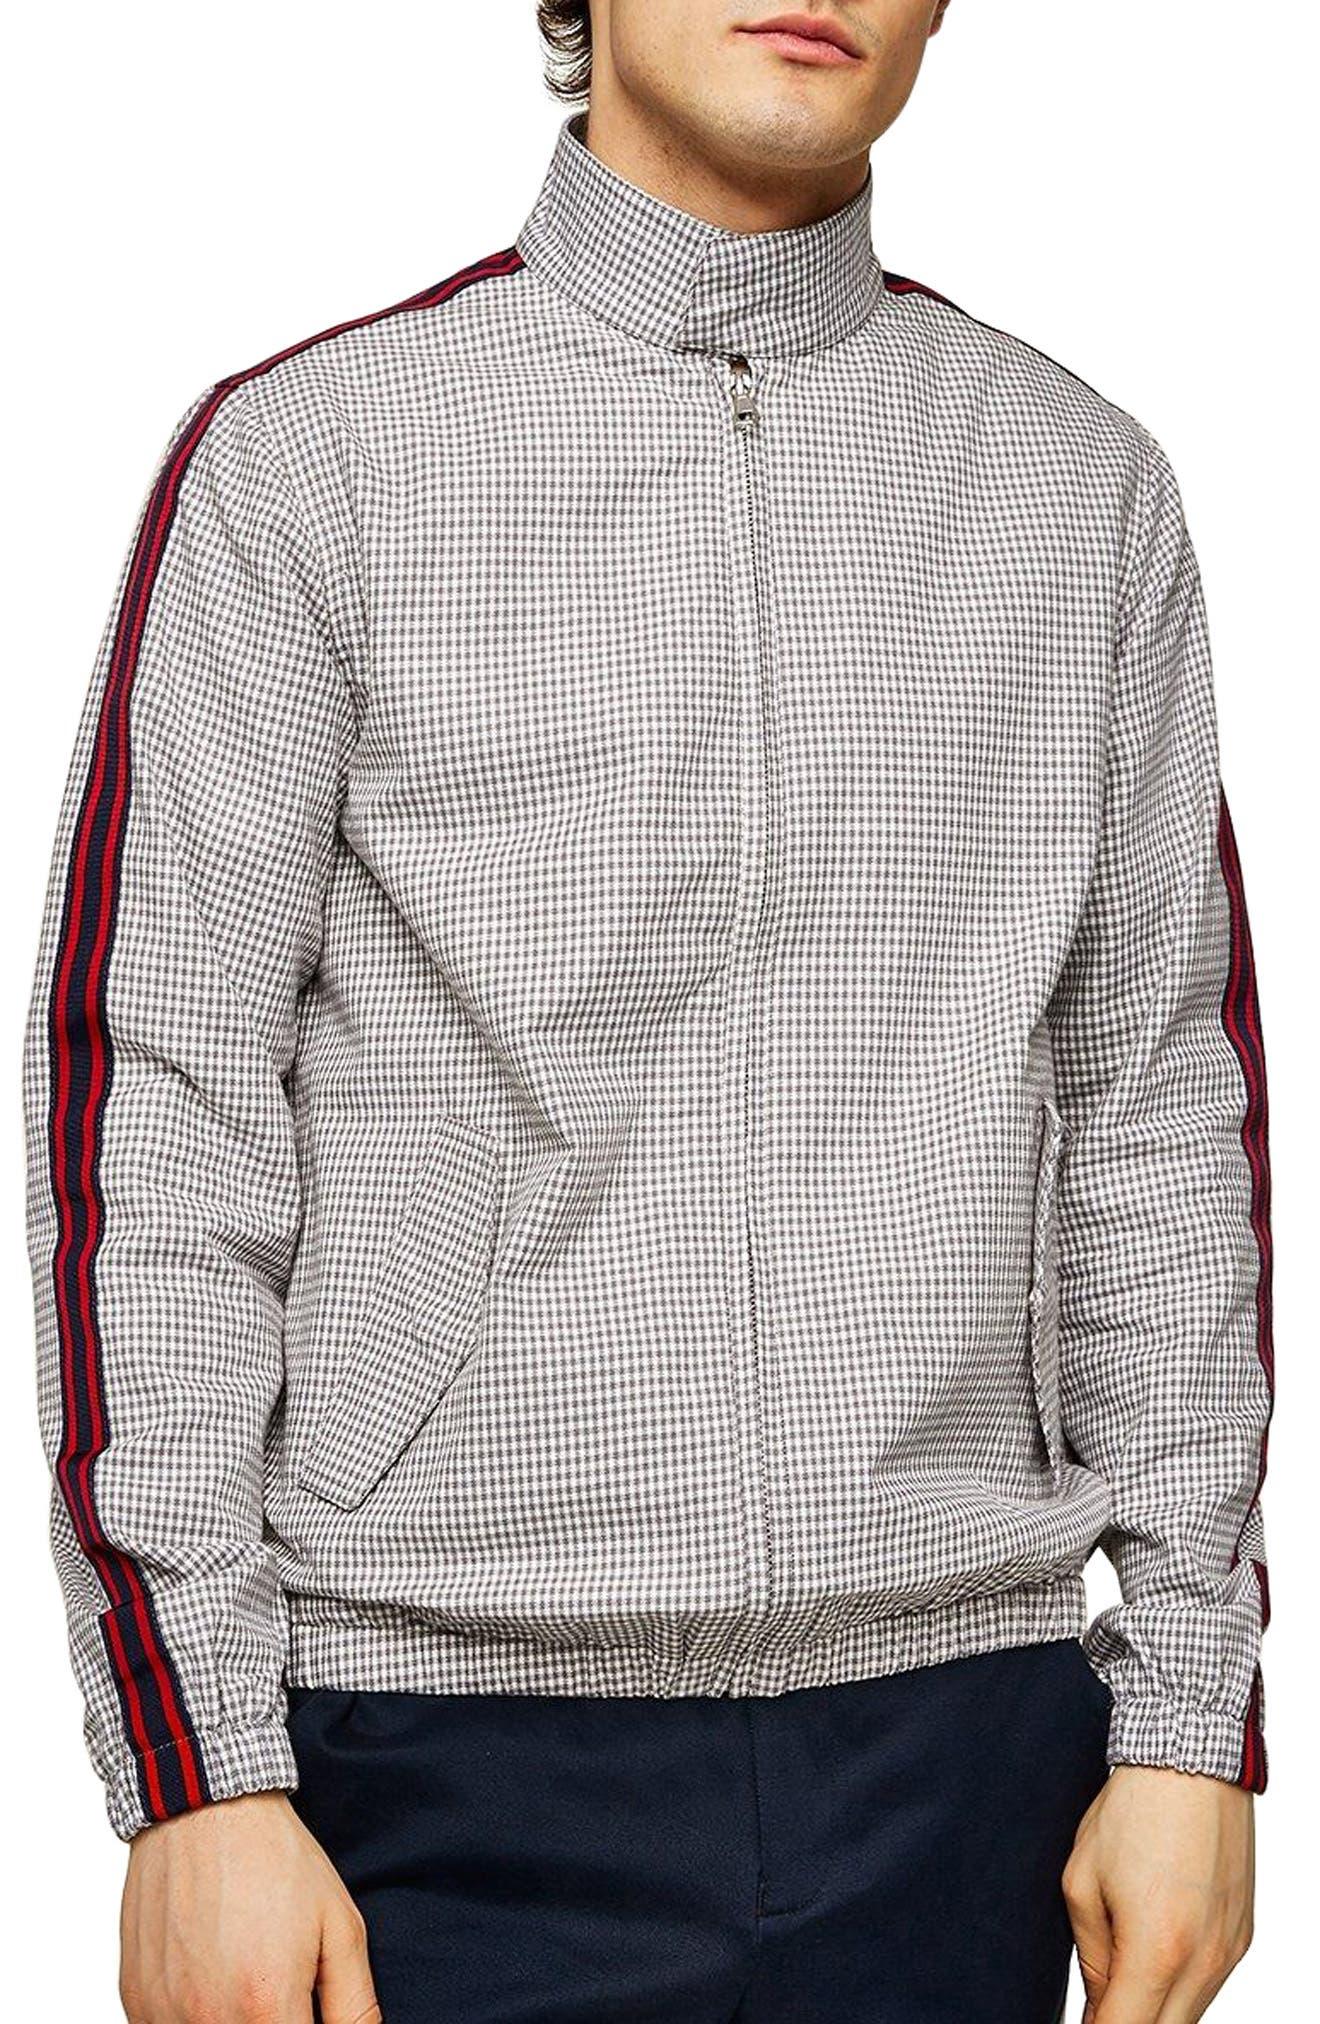 Topman Check Harrington Jacket